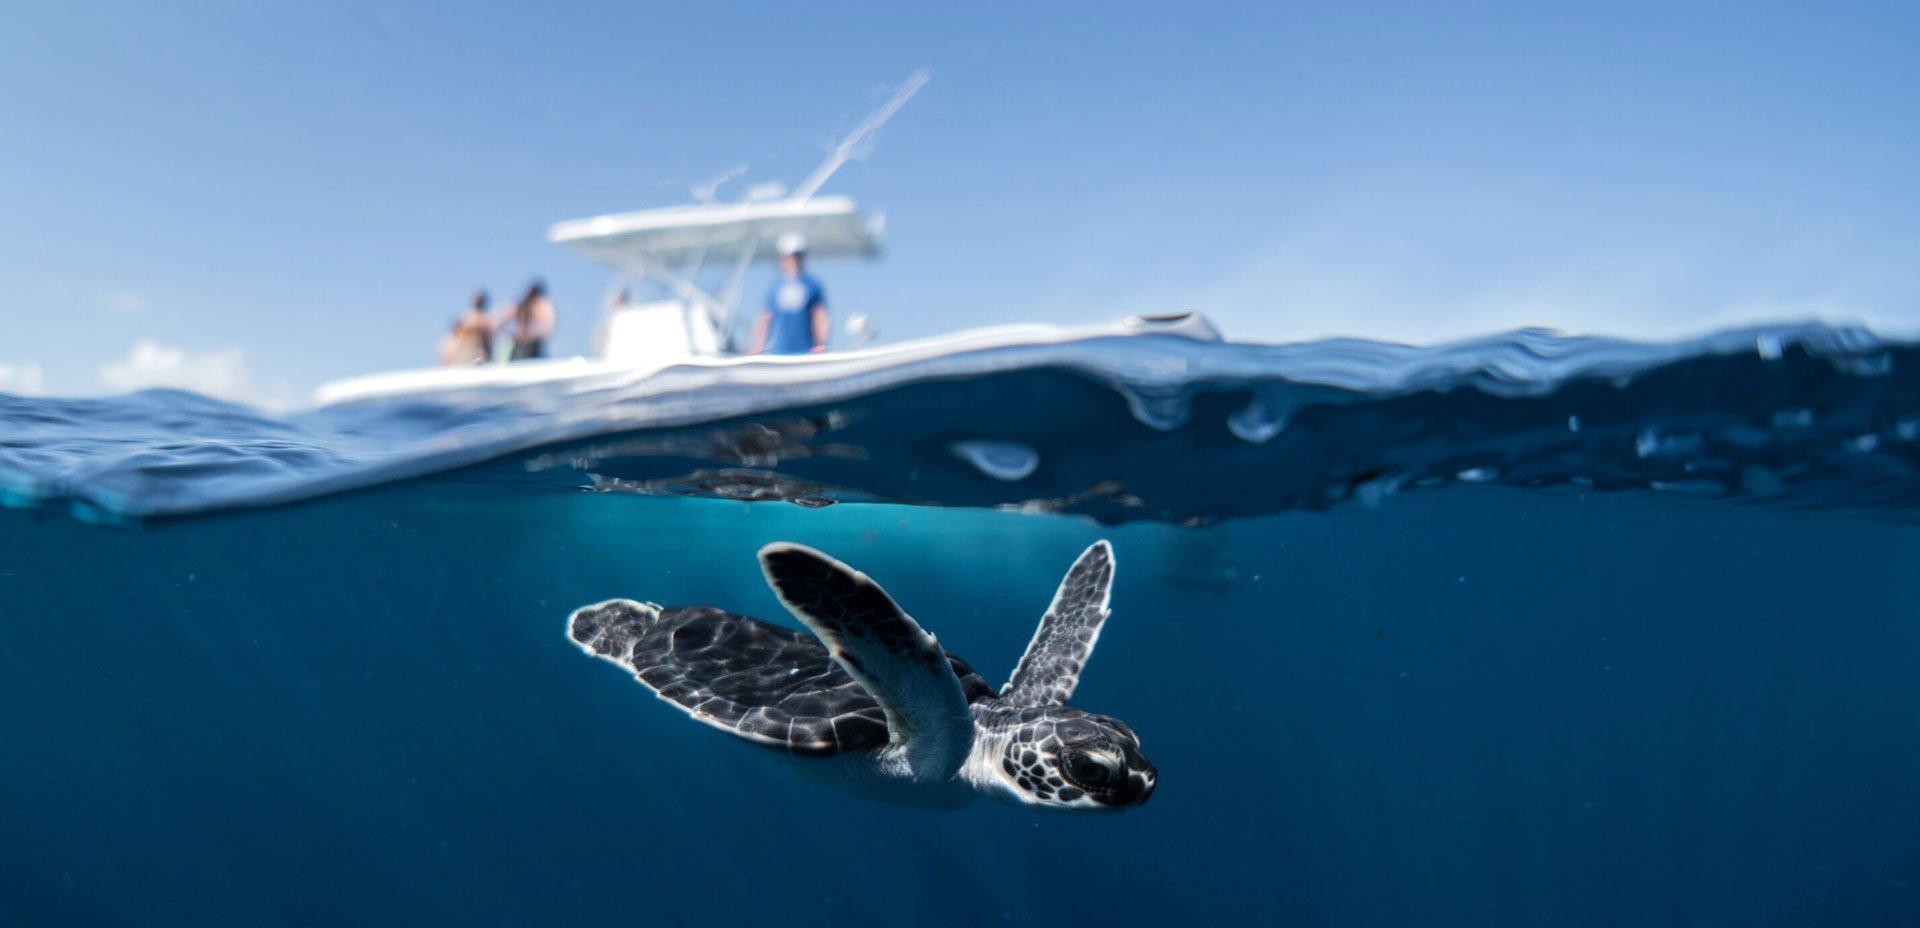 tartaruga nel mare